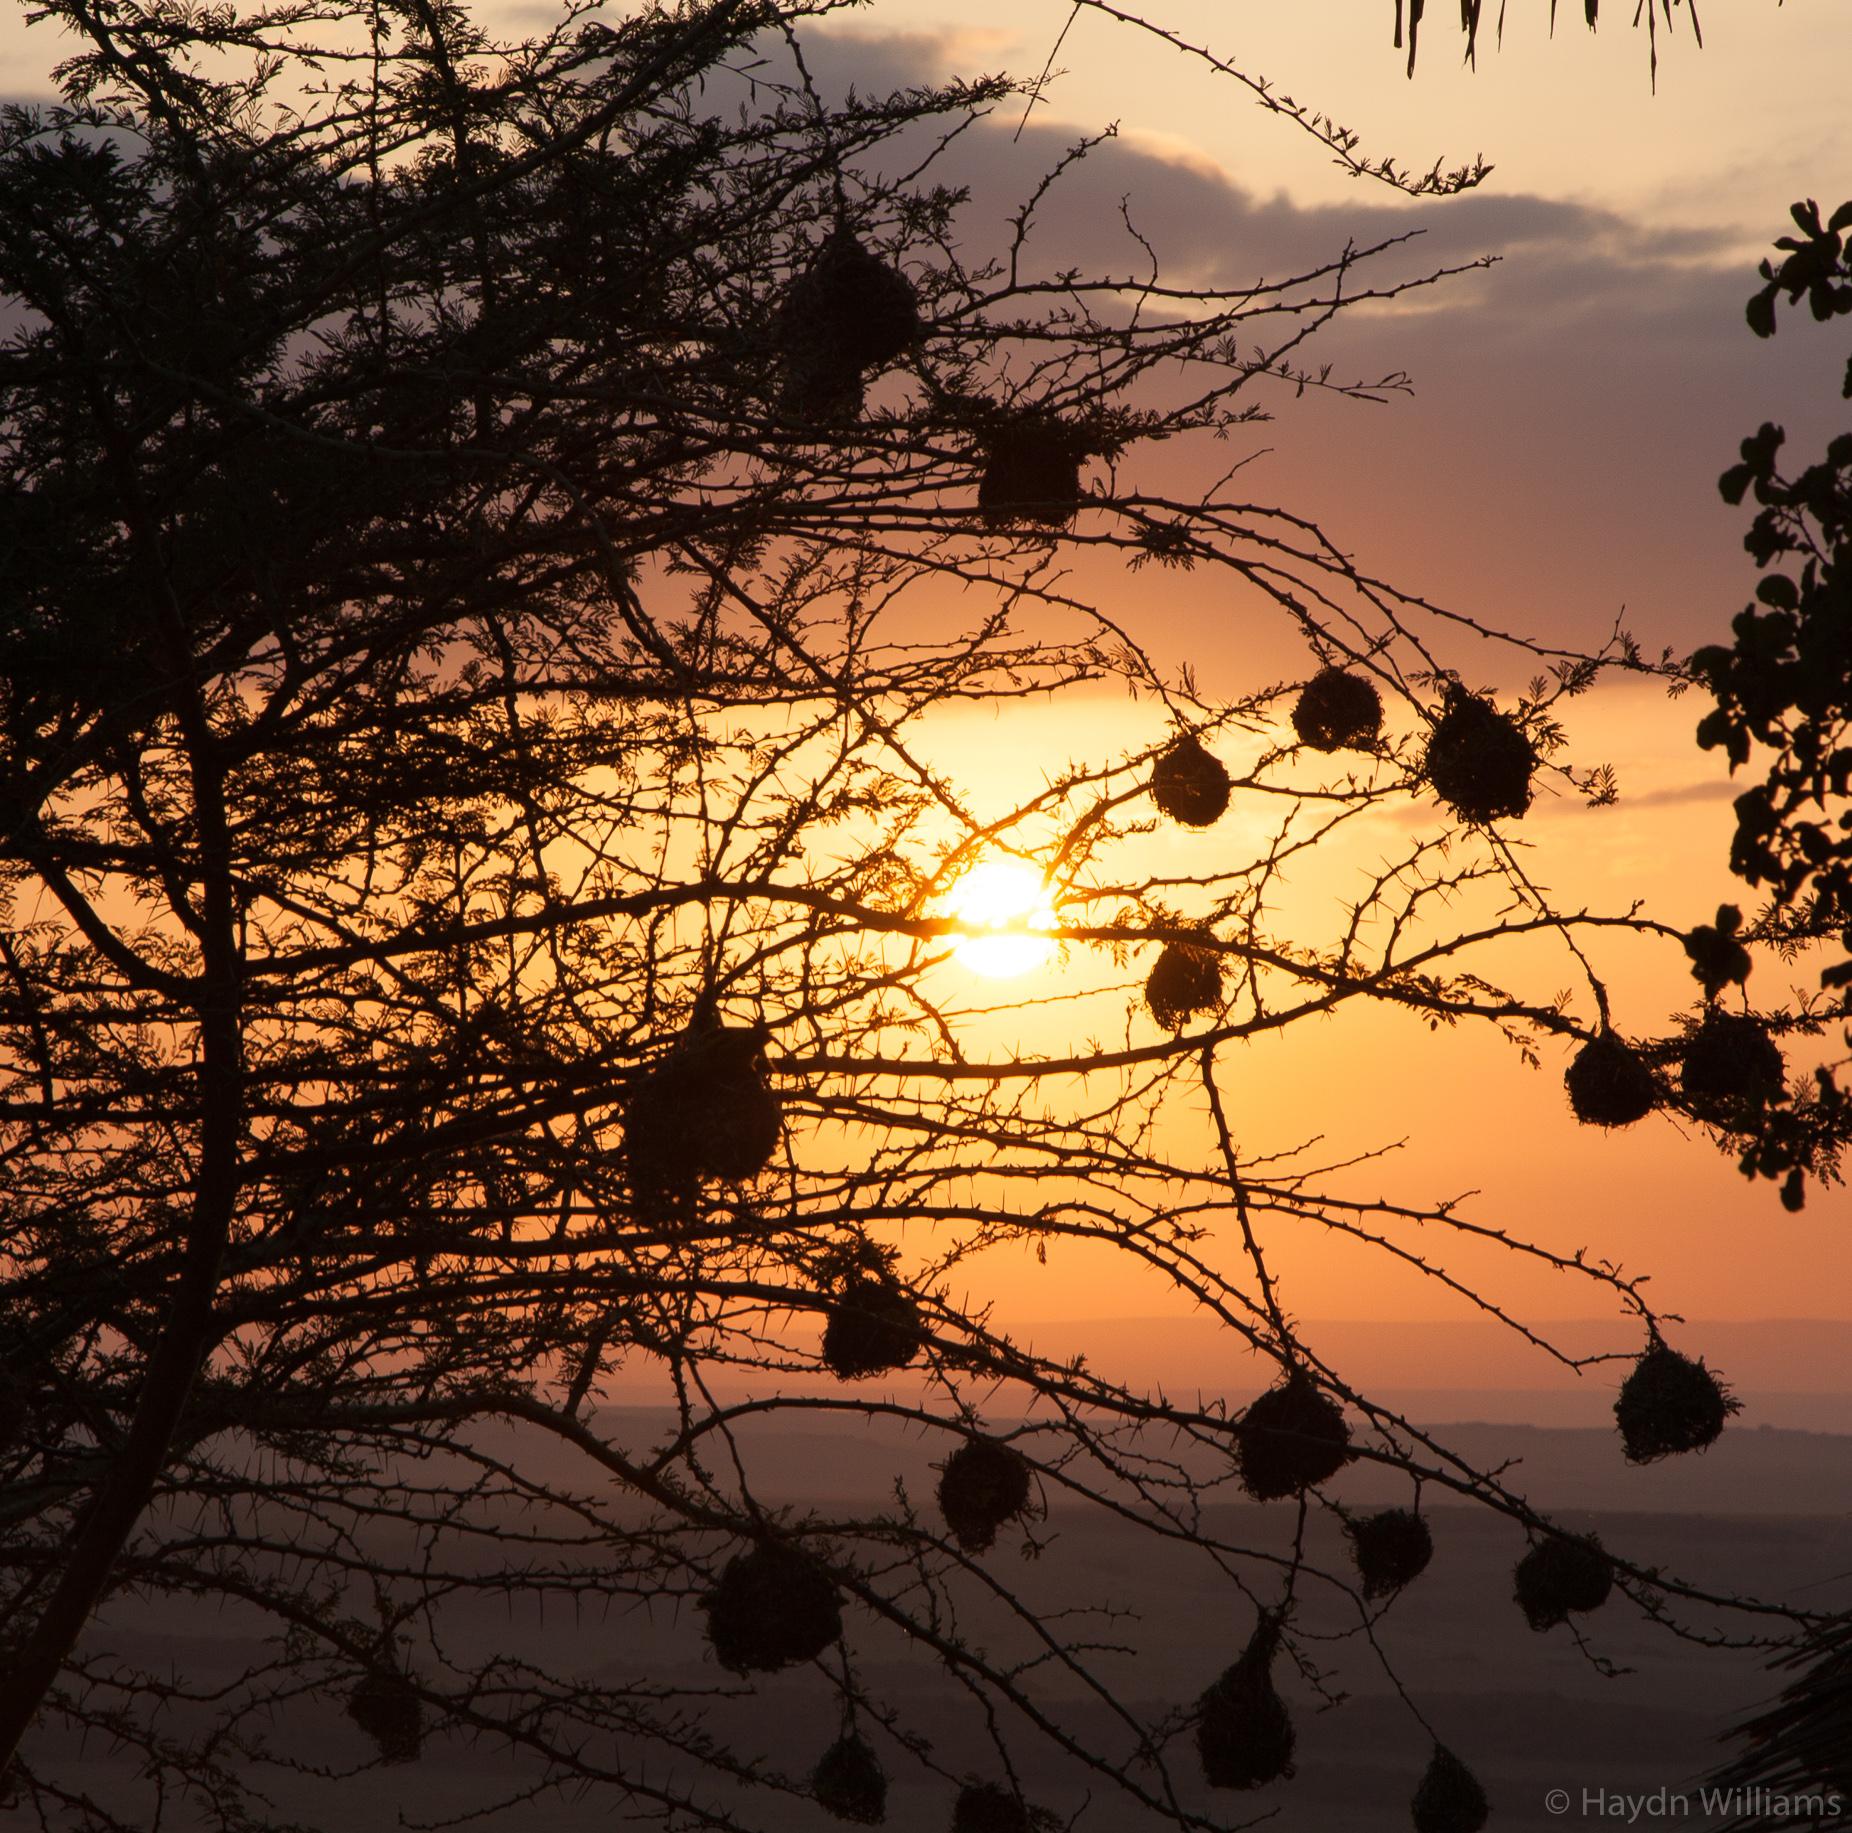 Weaver bird nests in a single tree. © Haydn Williams 2019